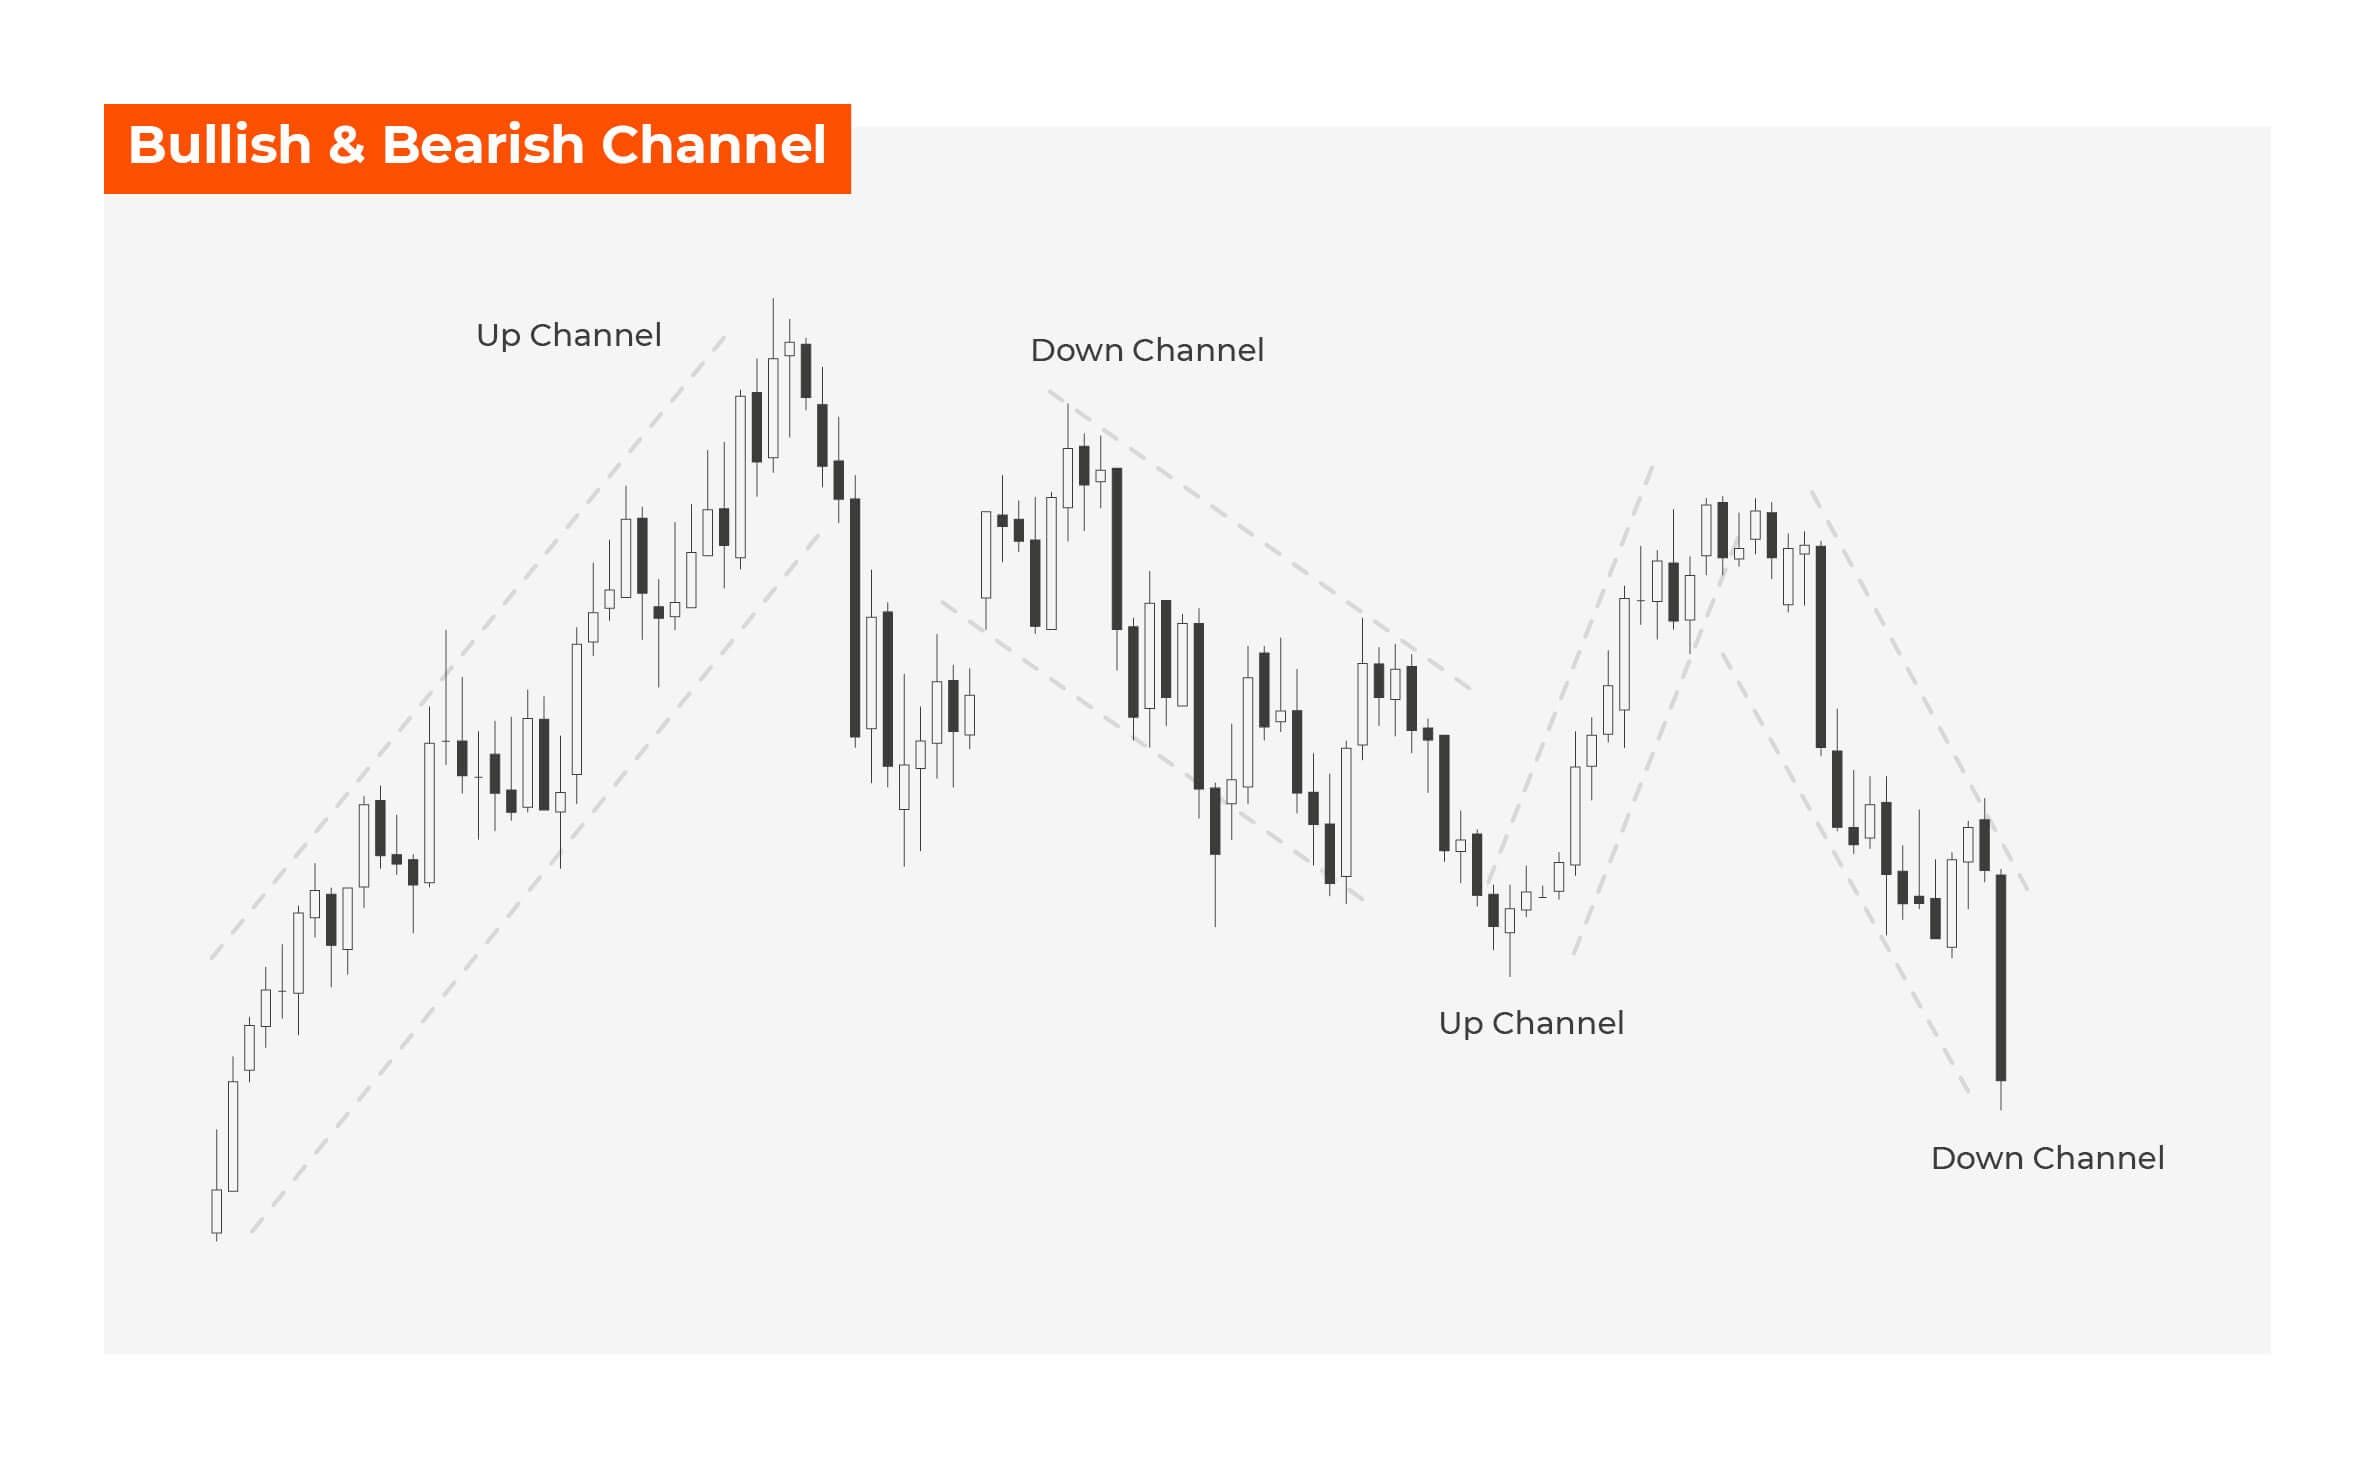 Bullish & Bearish Channel